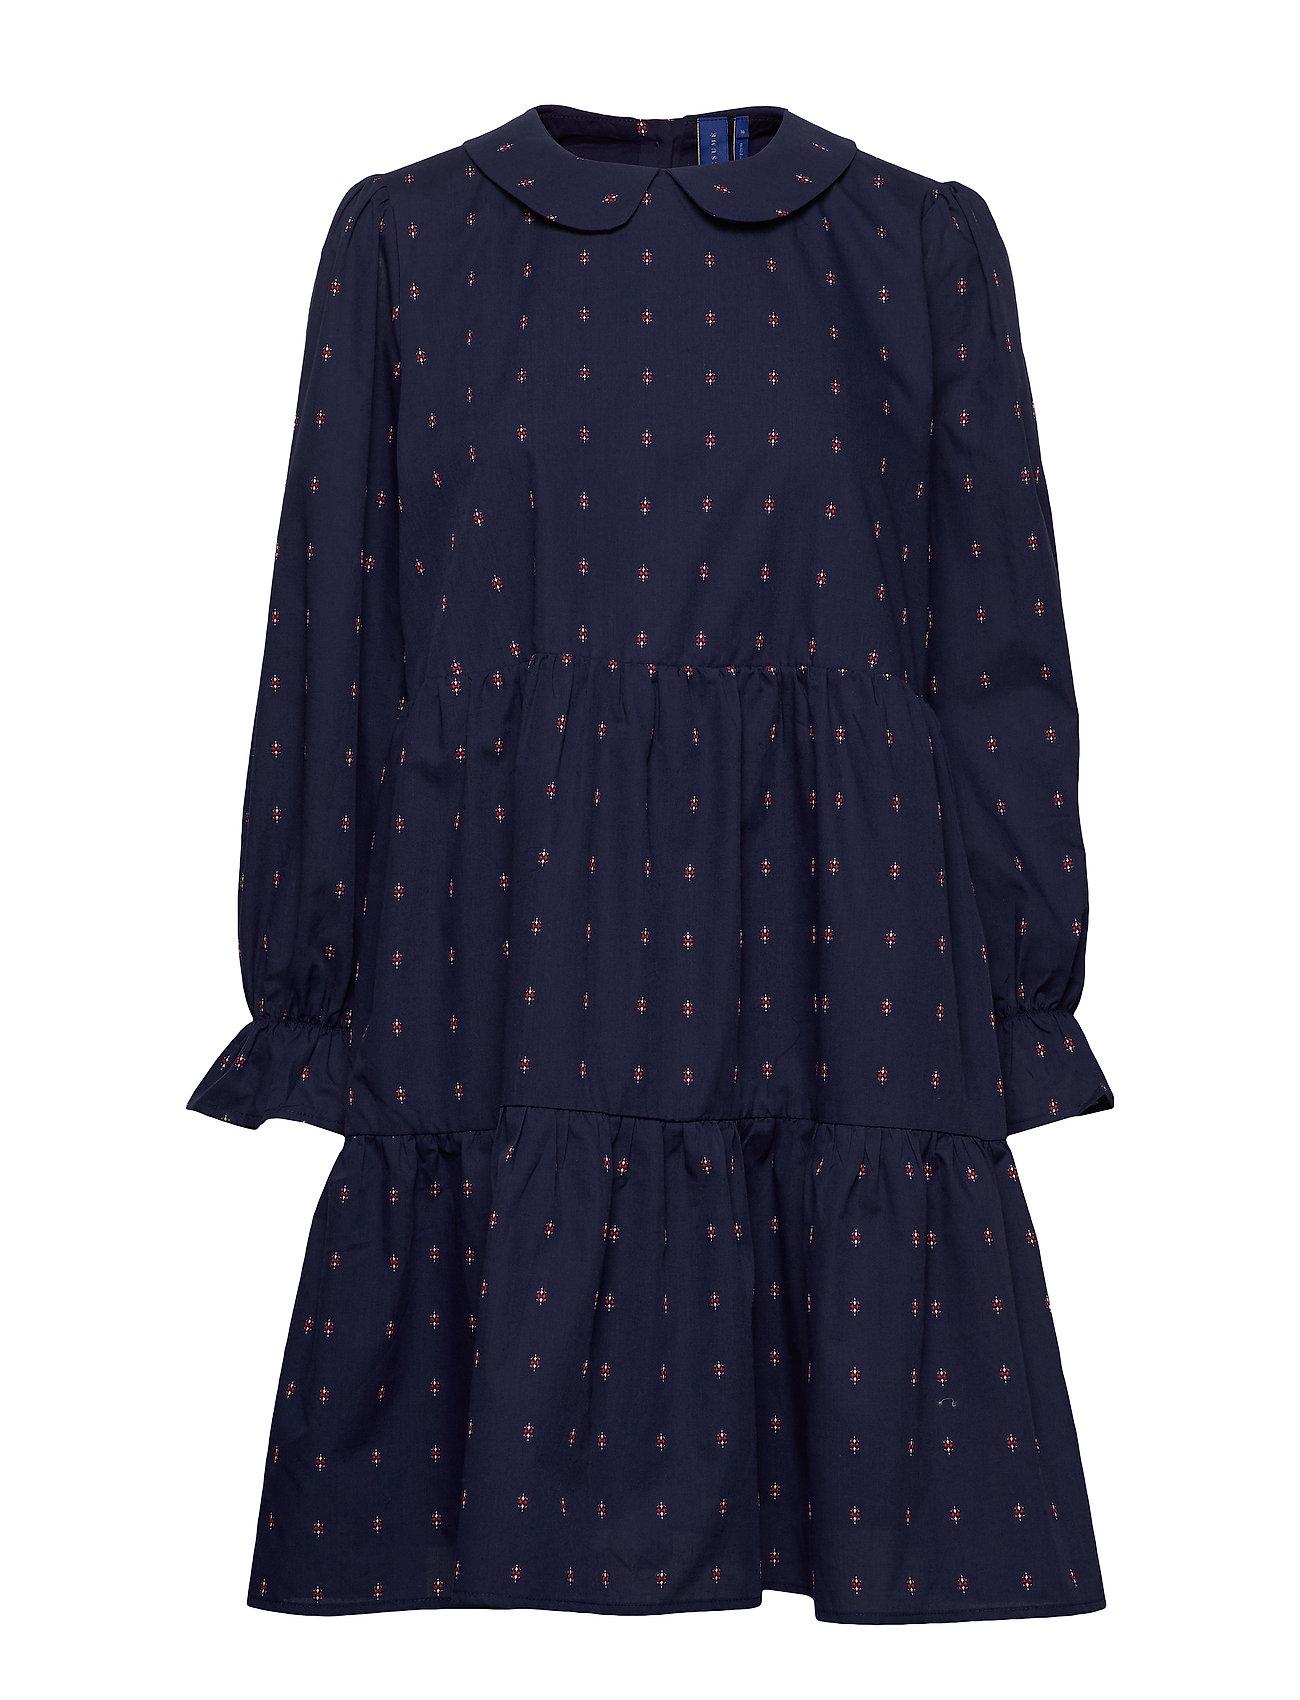 Image of Sif Dress Knælang Kjole Blå Résumé (3327444399)